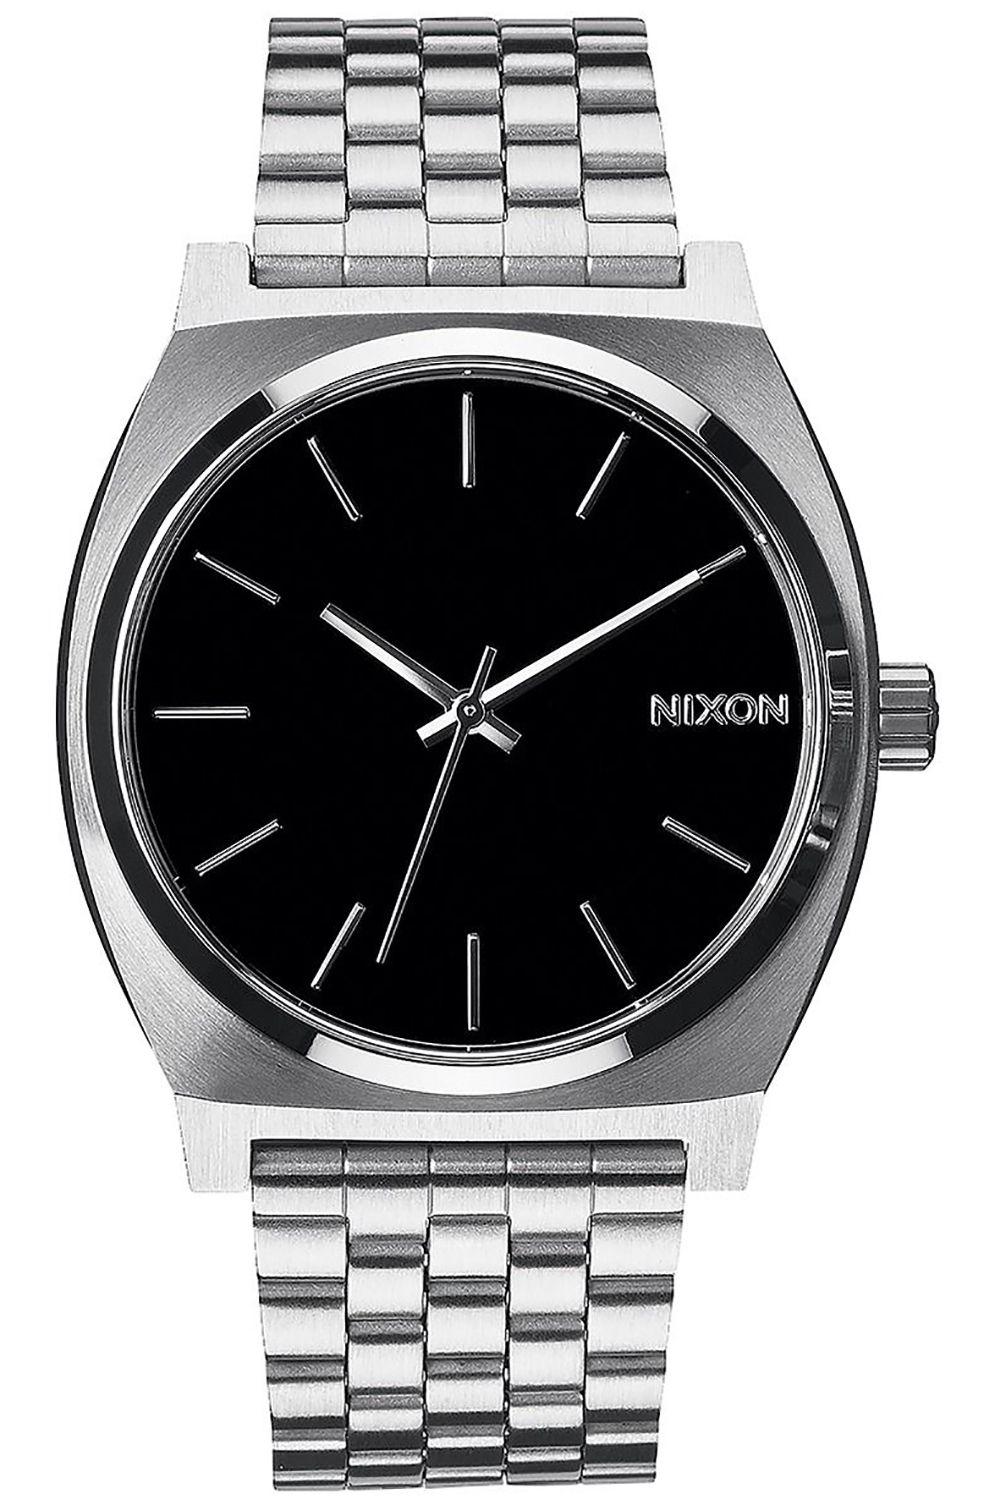 Relogio Nixon TIME TELLER Black